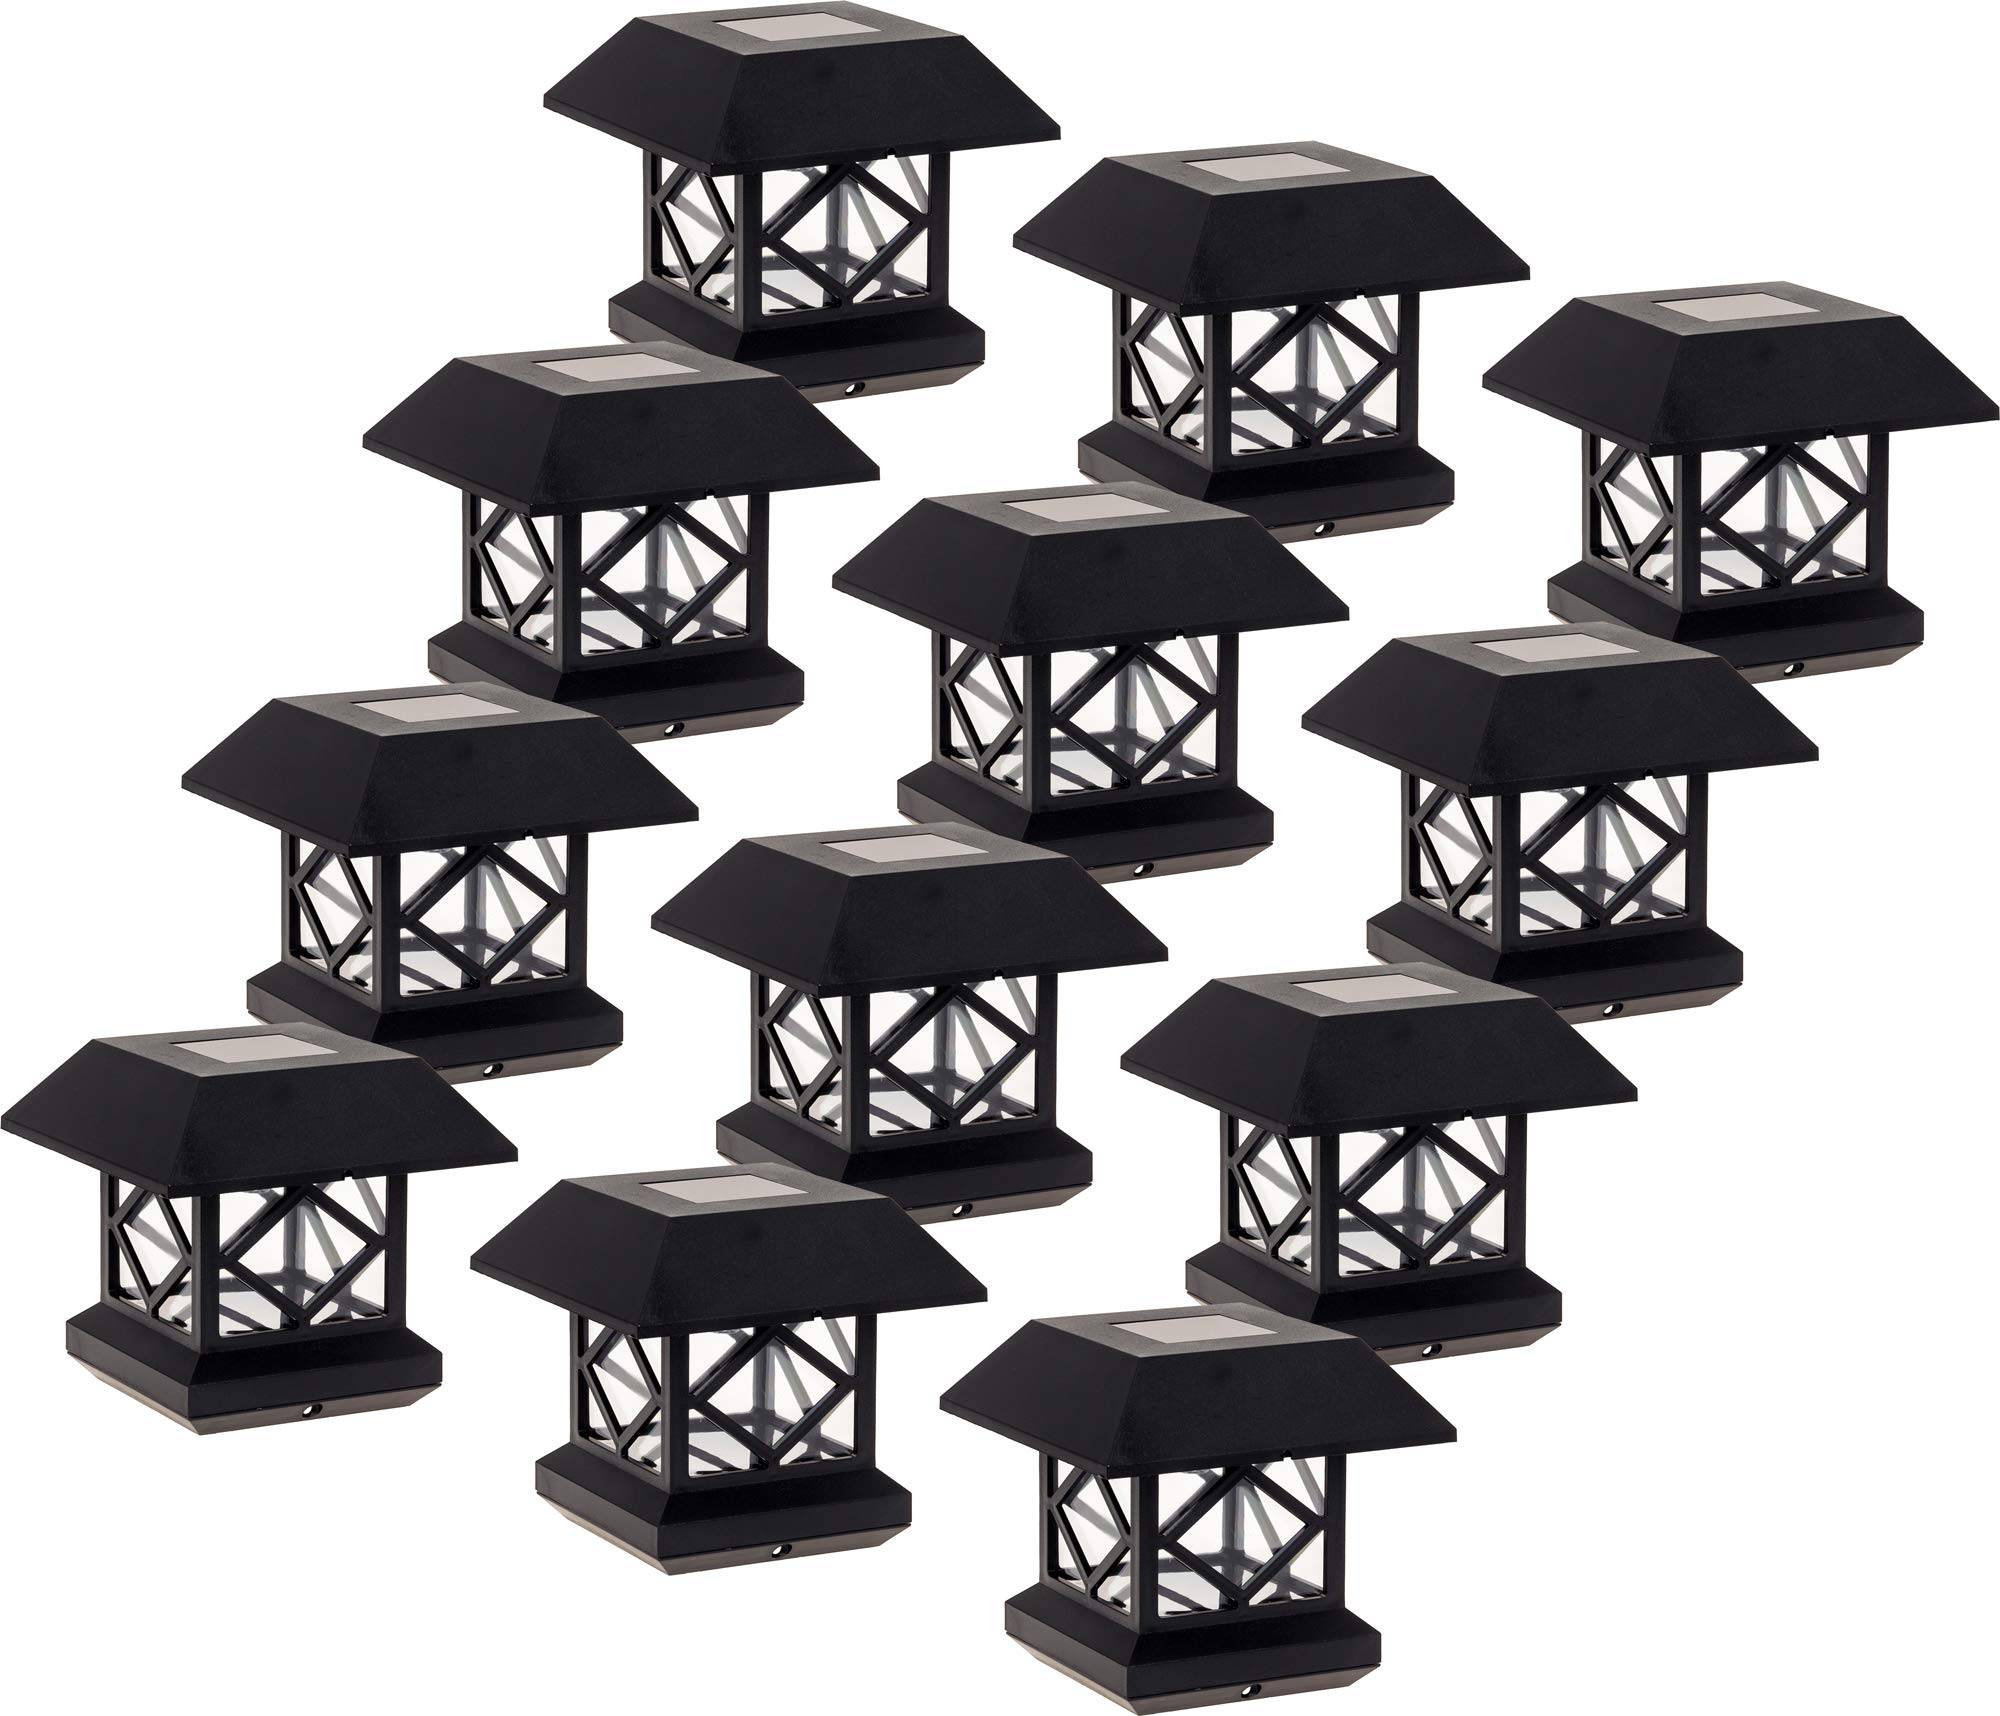 GreenLighting Outdoor Summit Solar Post Cap Light for 4x4 Wood Posts 12 Pack (Black)